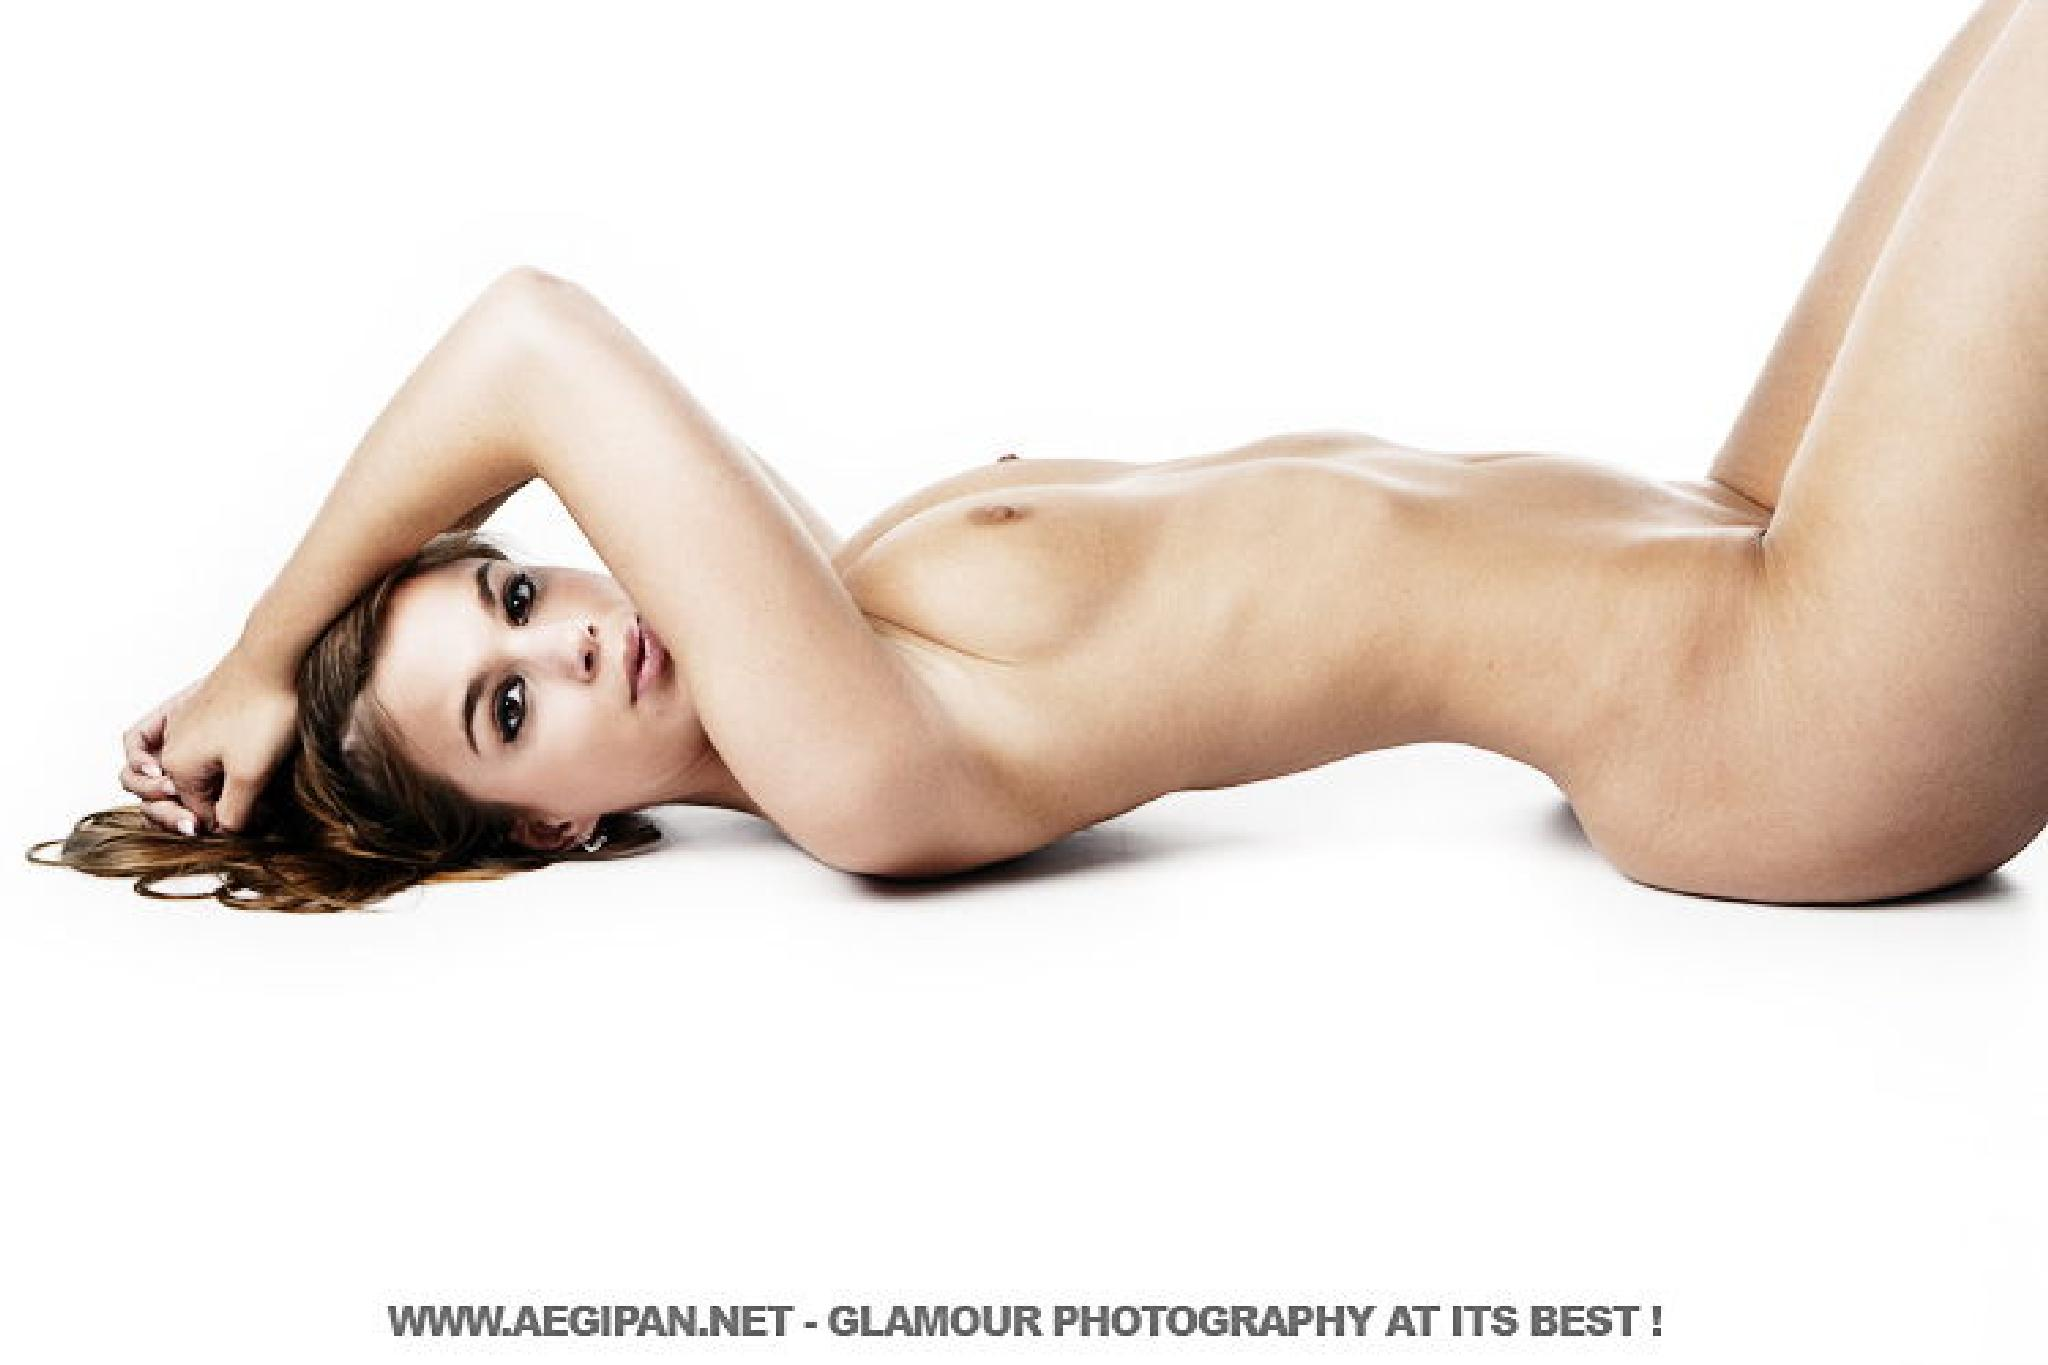 The Naked Truth  by David 'AEGIPAN' H.